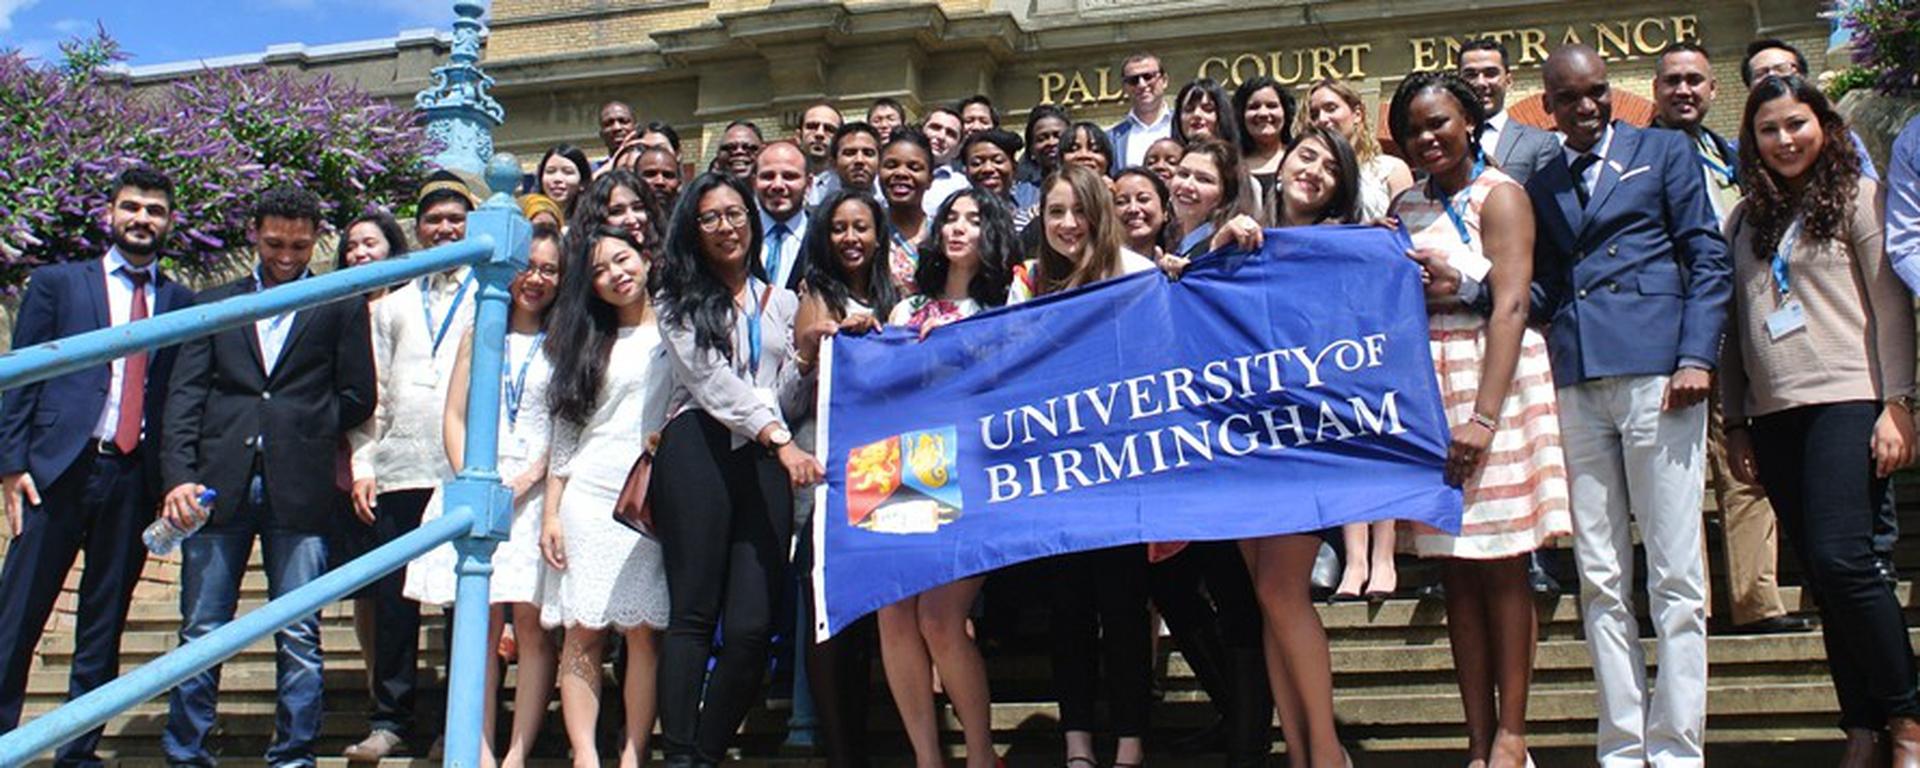 University of Birmingham - The Commonwealth Scholarships Movemeback African initiative cover image